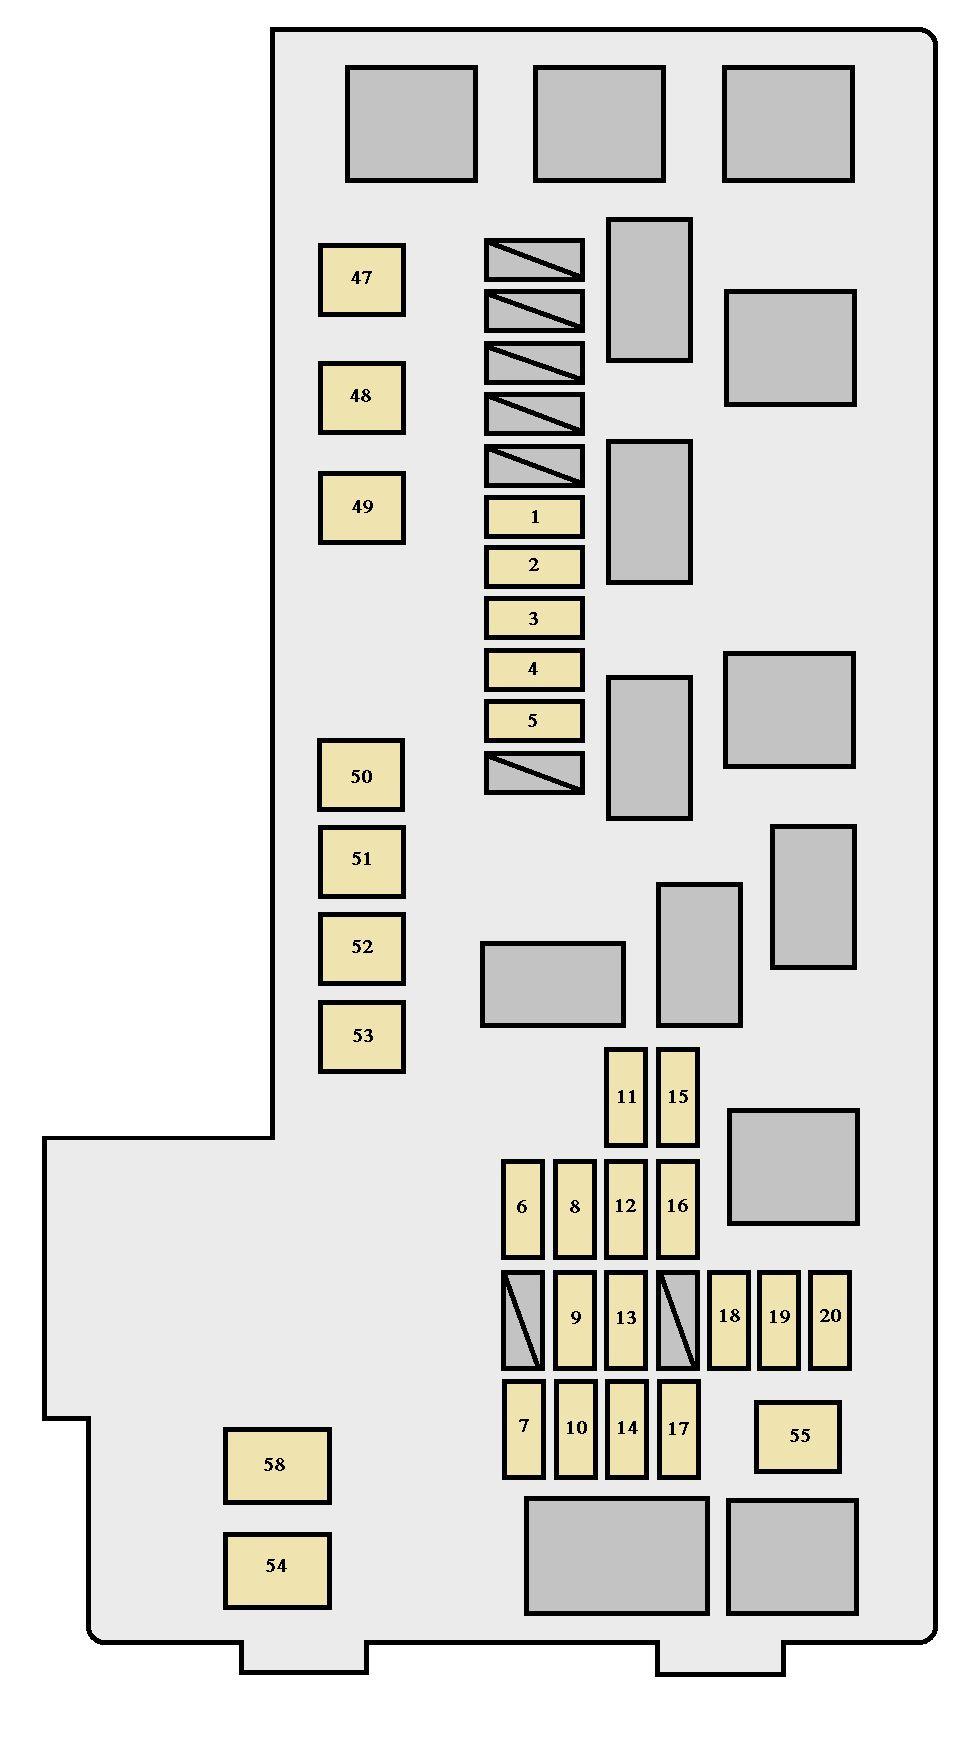 Diagram 2000 Corolla Le Fuse Diagram Full Version Hd Quality Fuse Diagram Csiwiring Villaroveri It